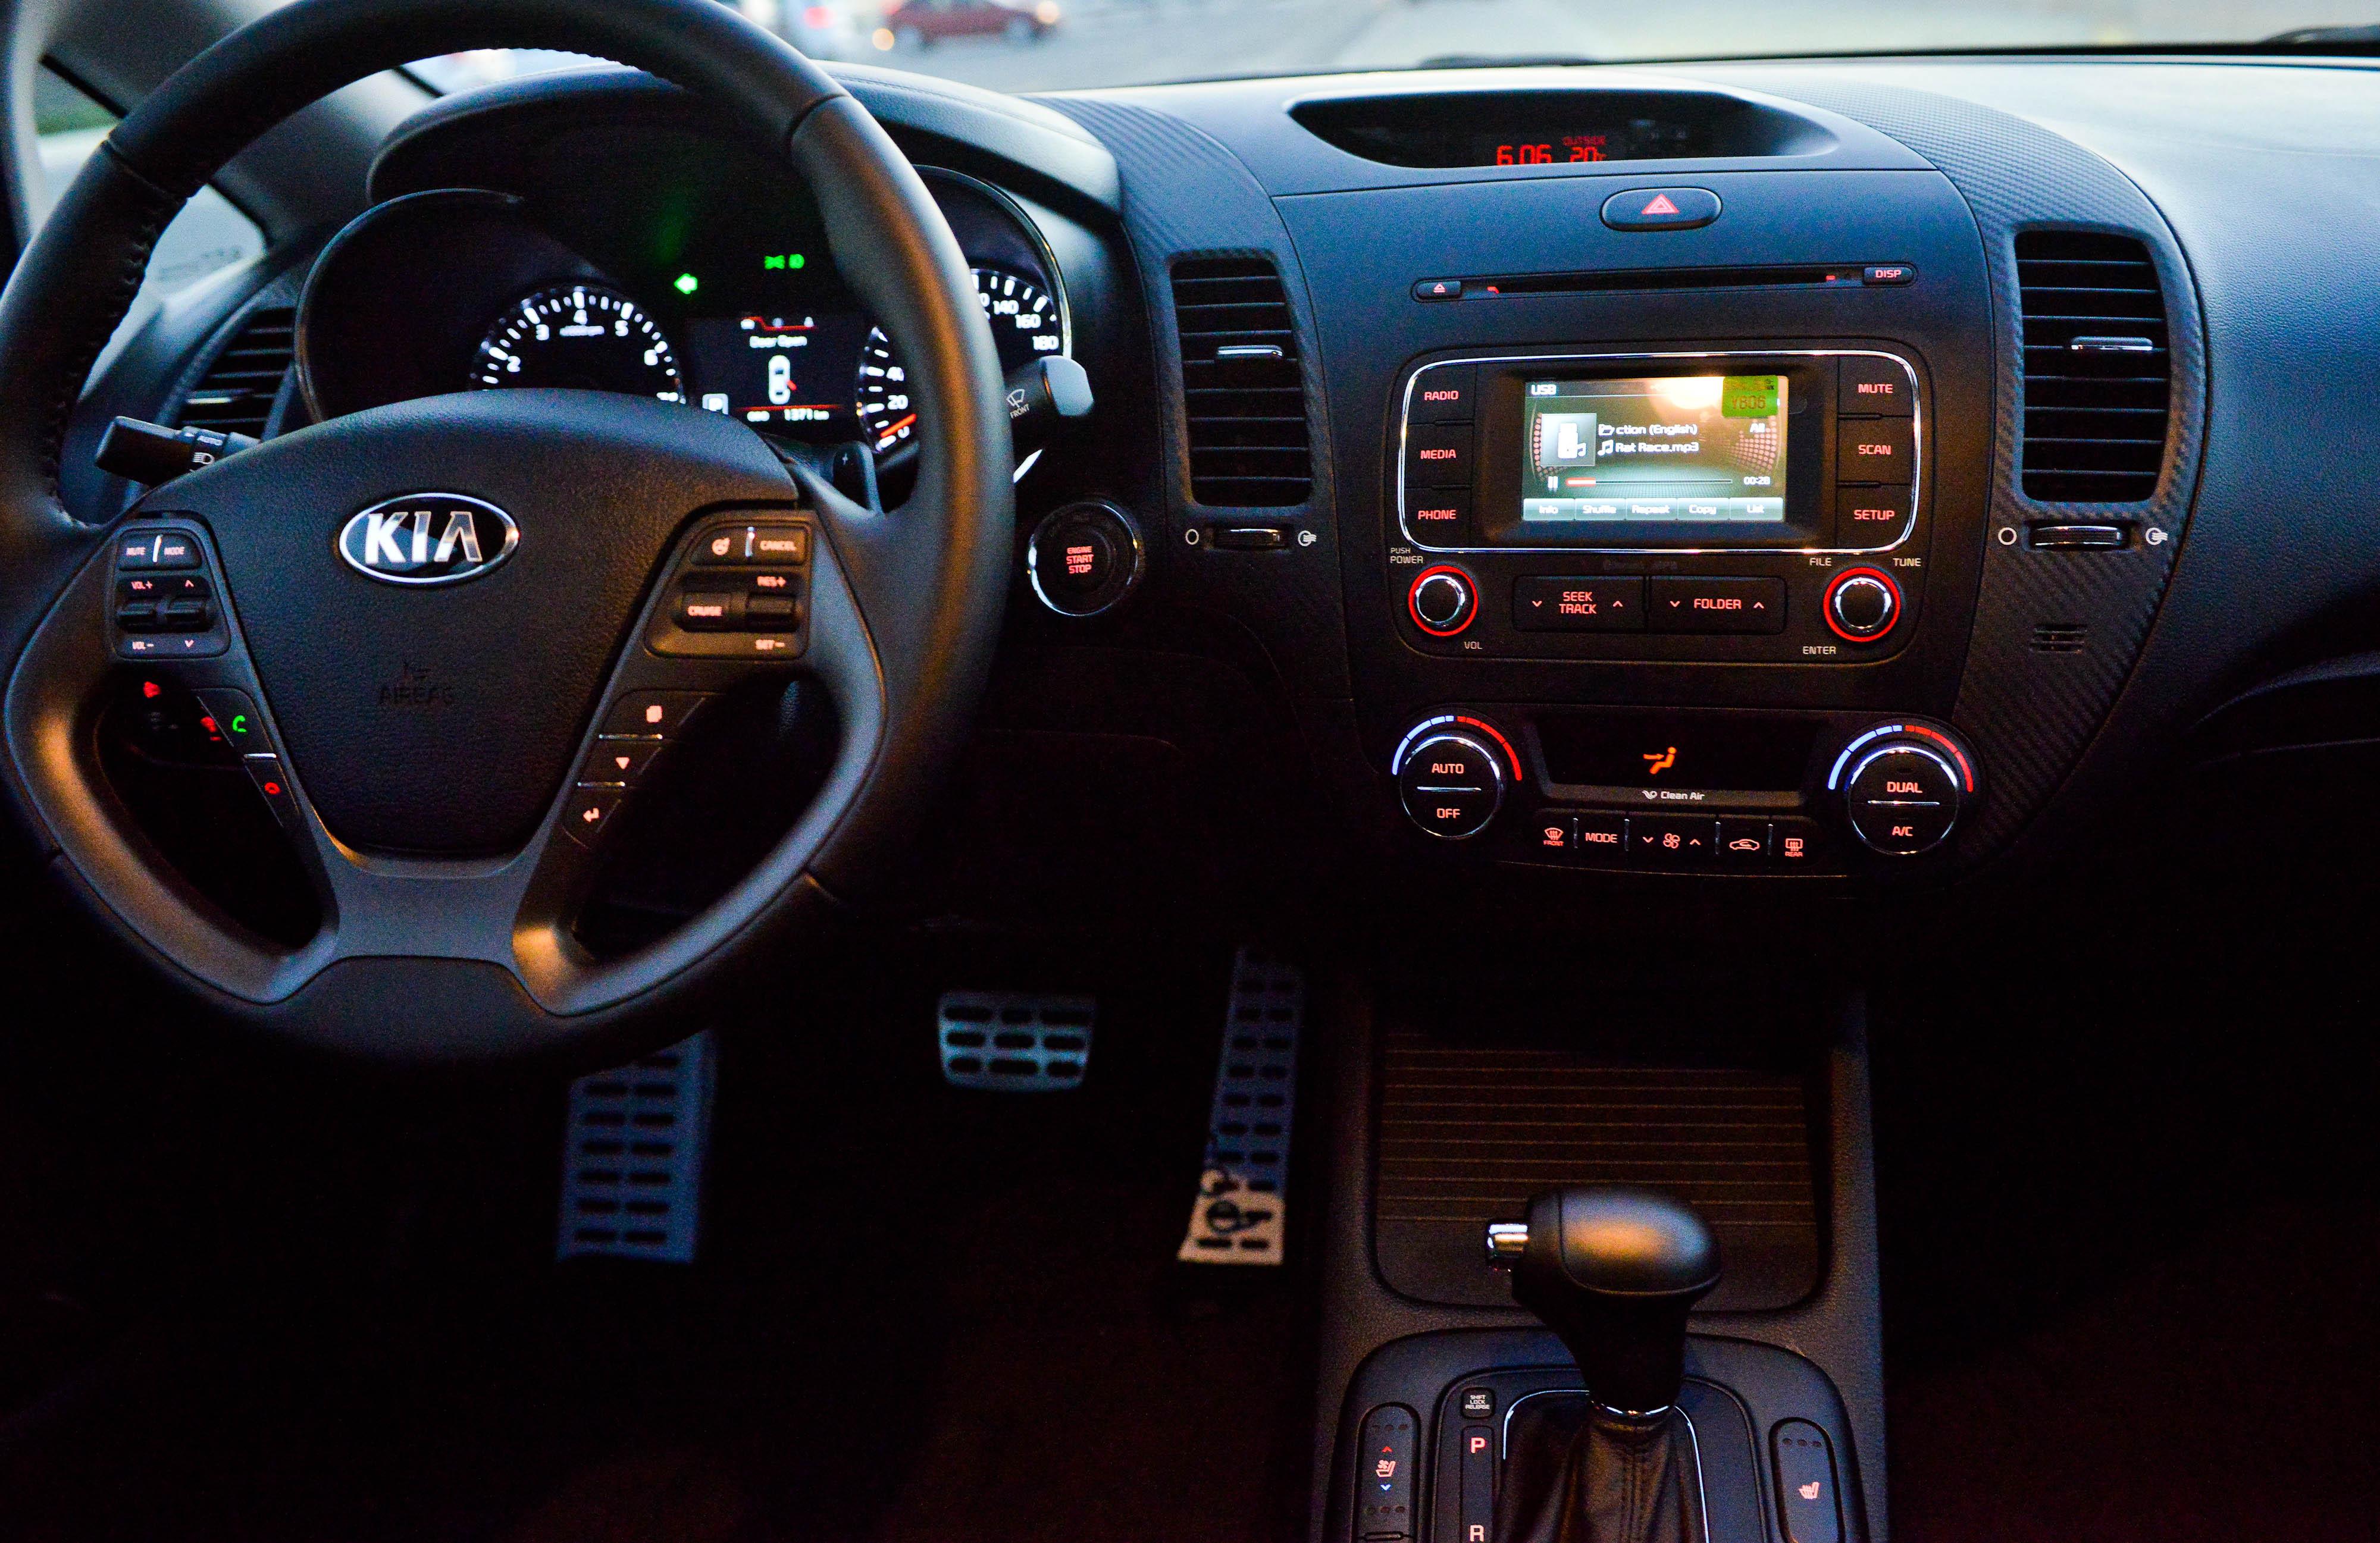 Kia Optima 2017 Interior >> Kia Cerato 2013 1.6L Sedan in UAE: New Car Prices, Specs